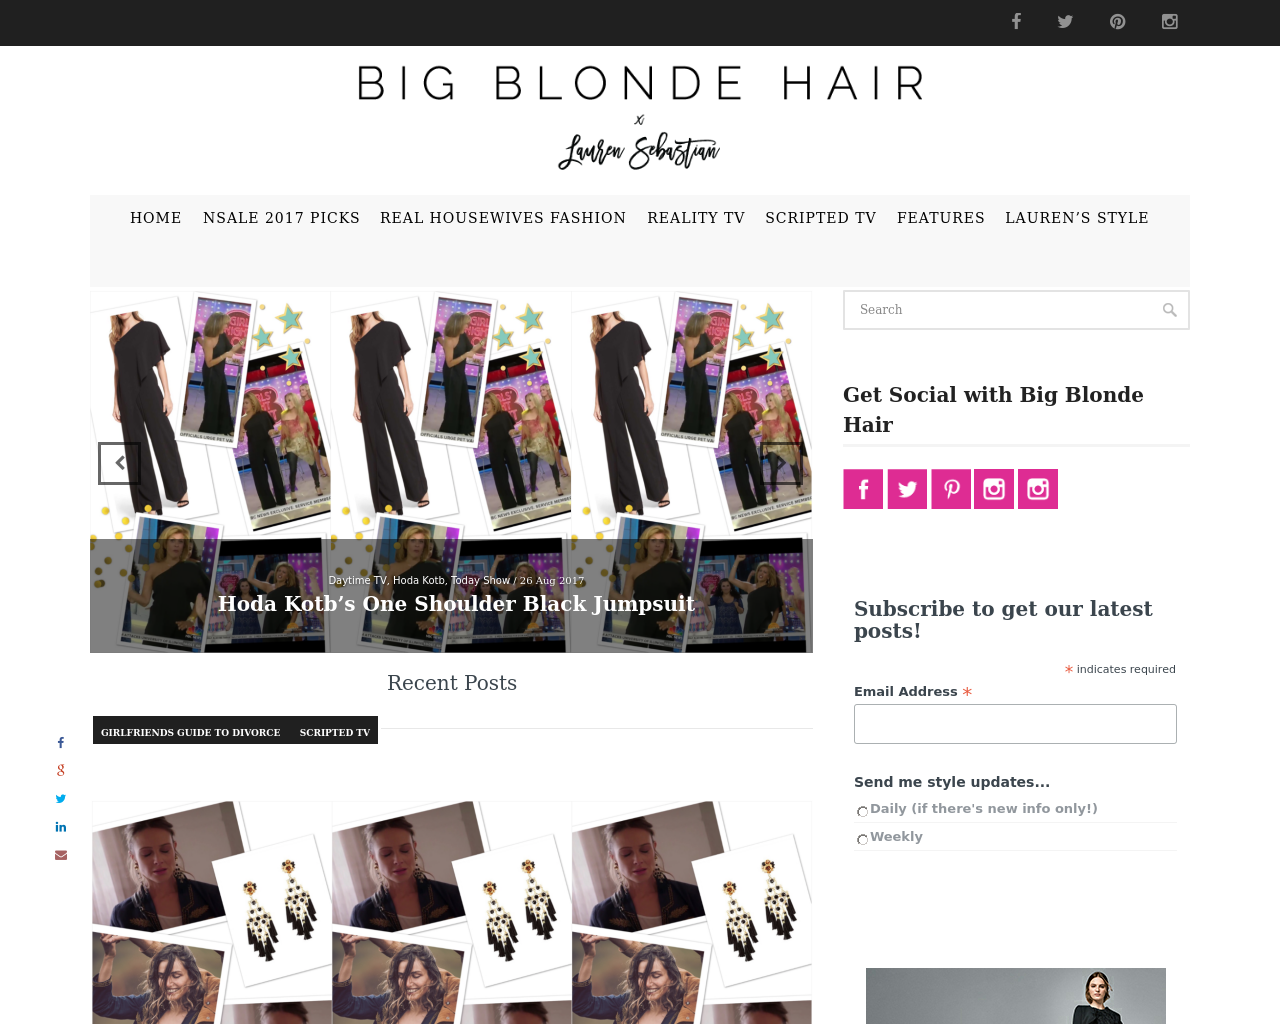 BIG-BLONDE-HAIR-Advertising-Reviews-Pricing